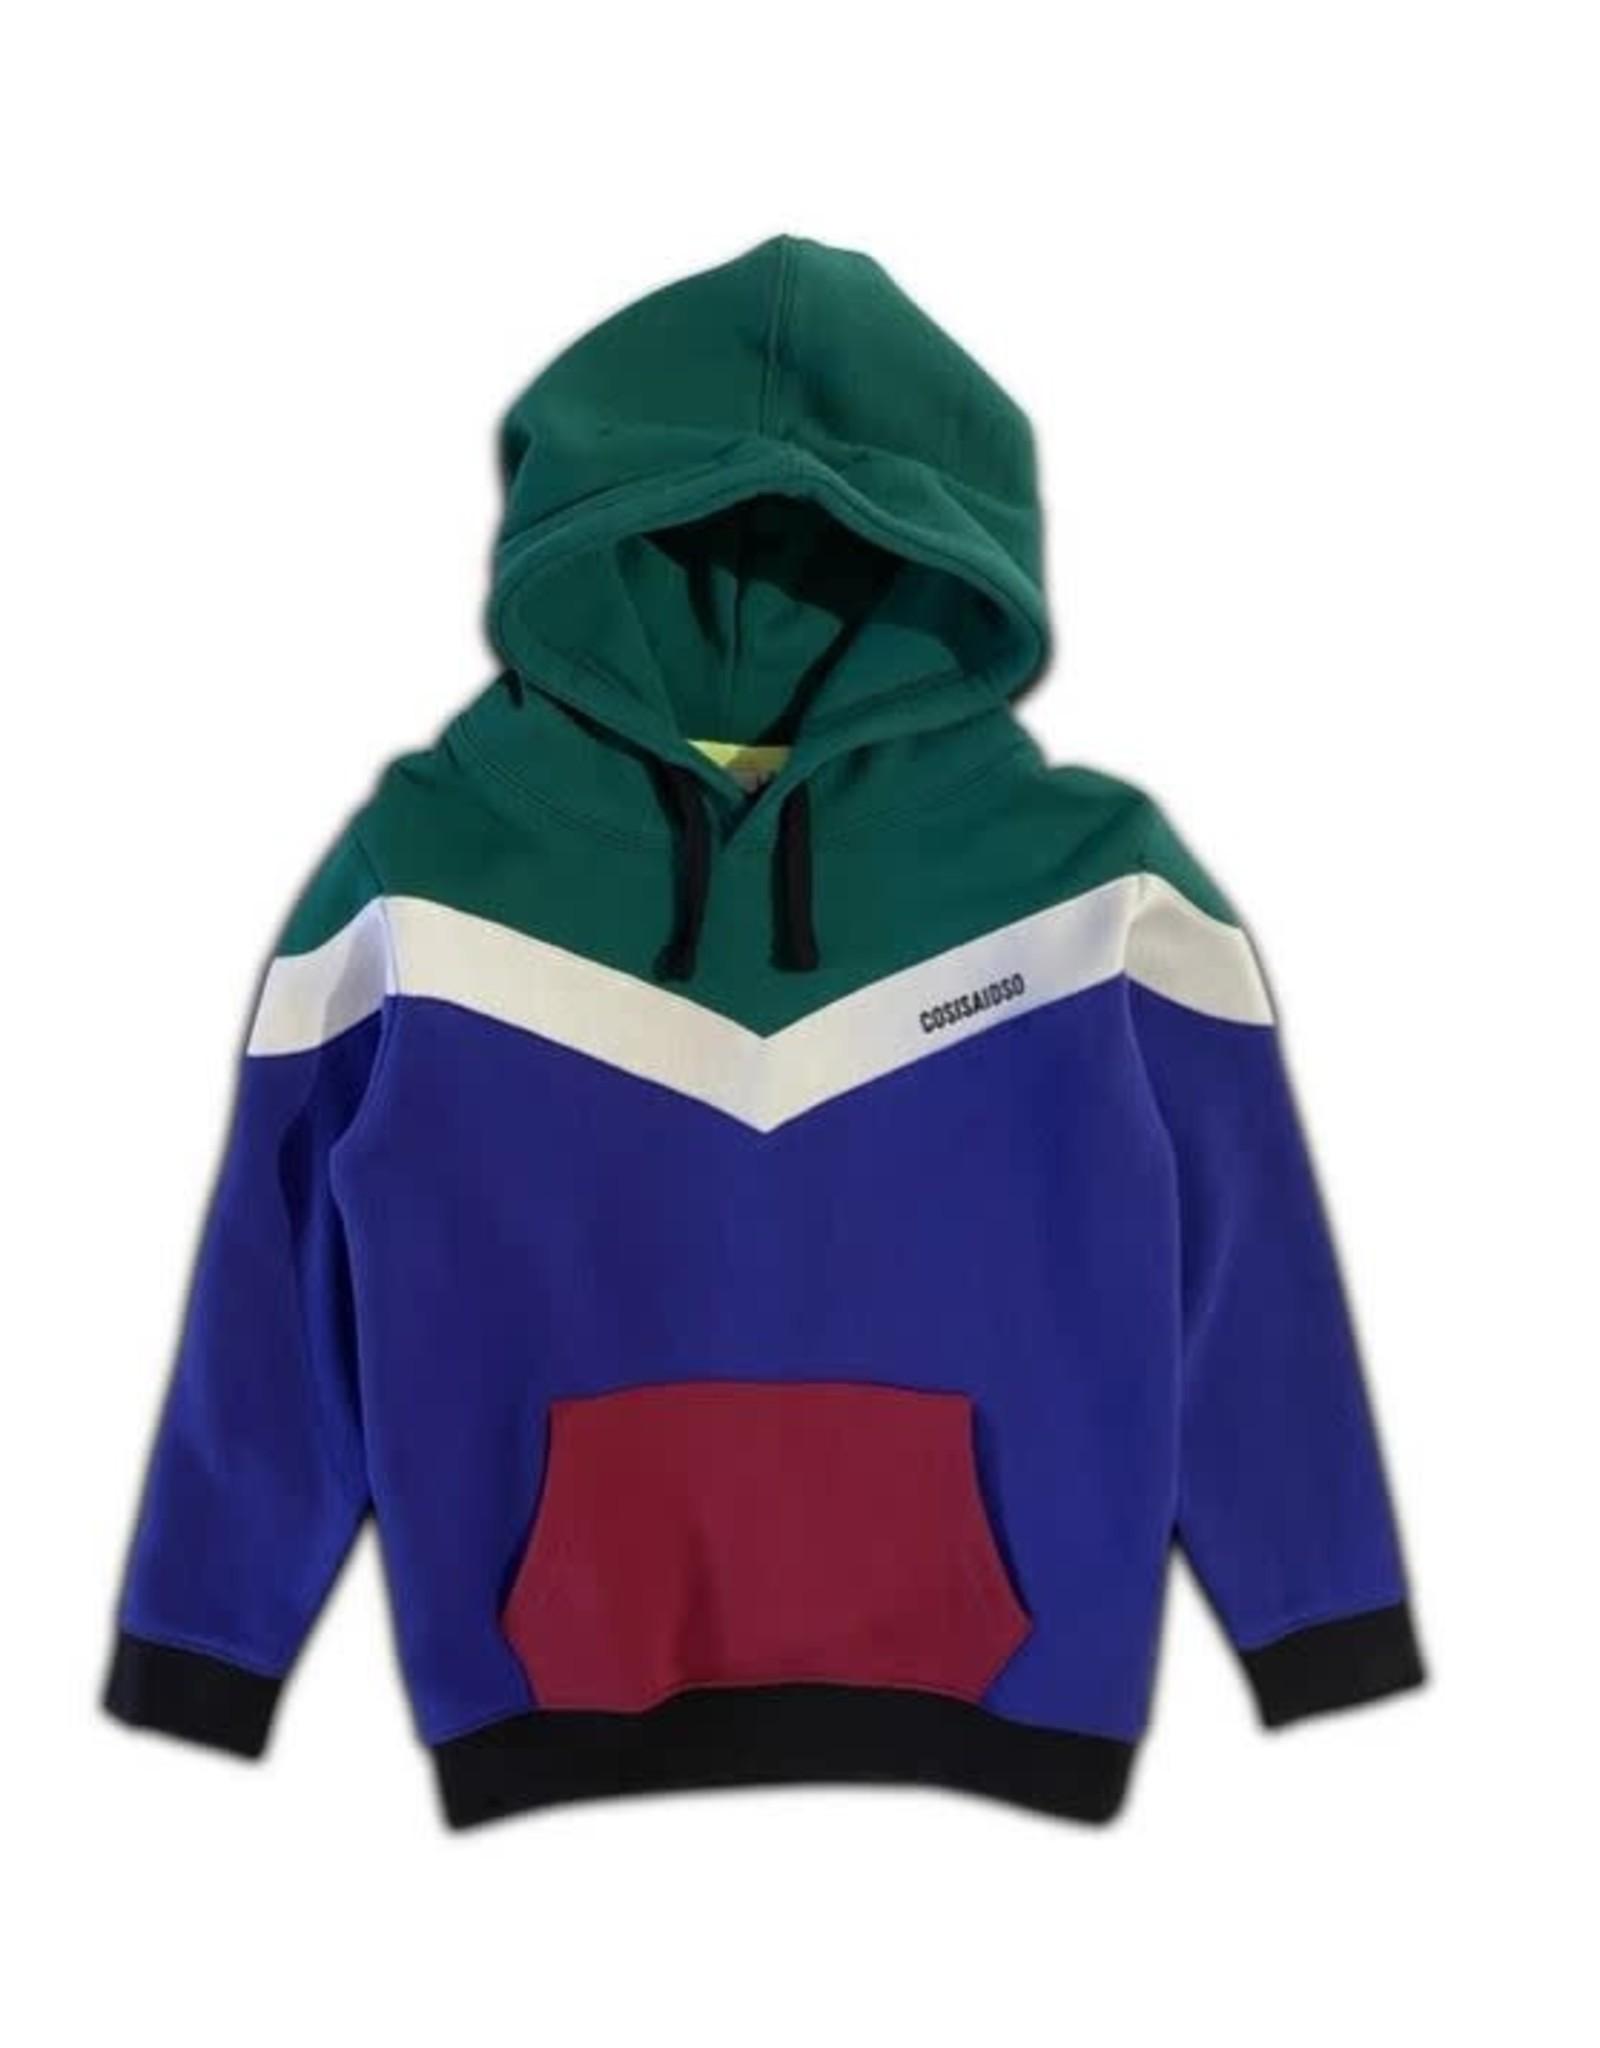 Cos I Said So colorblock hoodie alpine